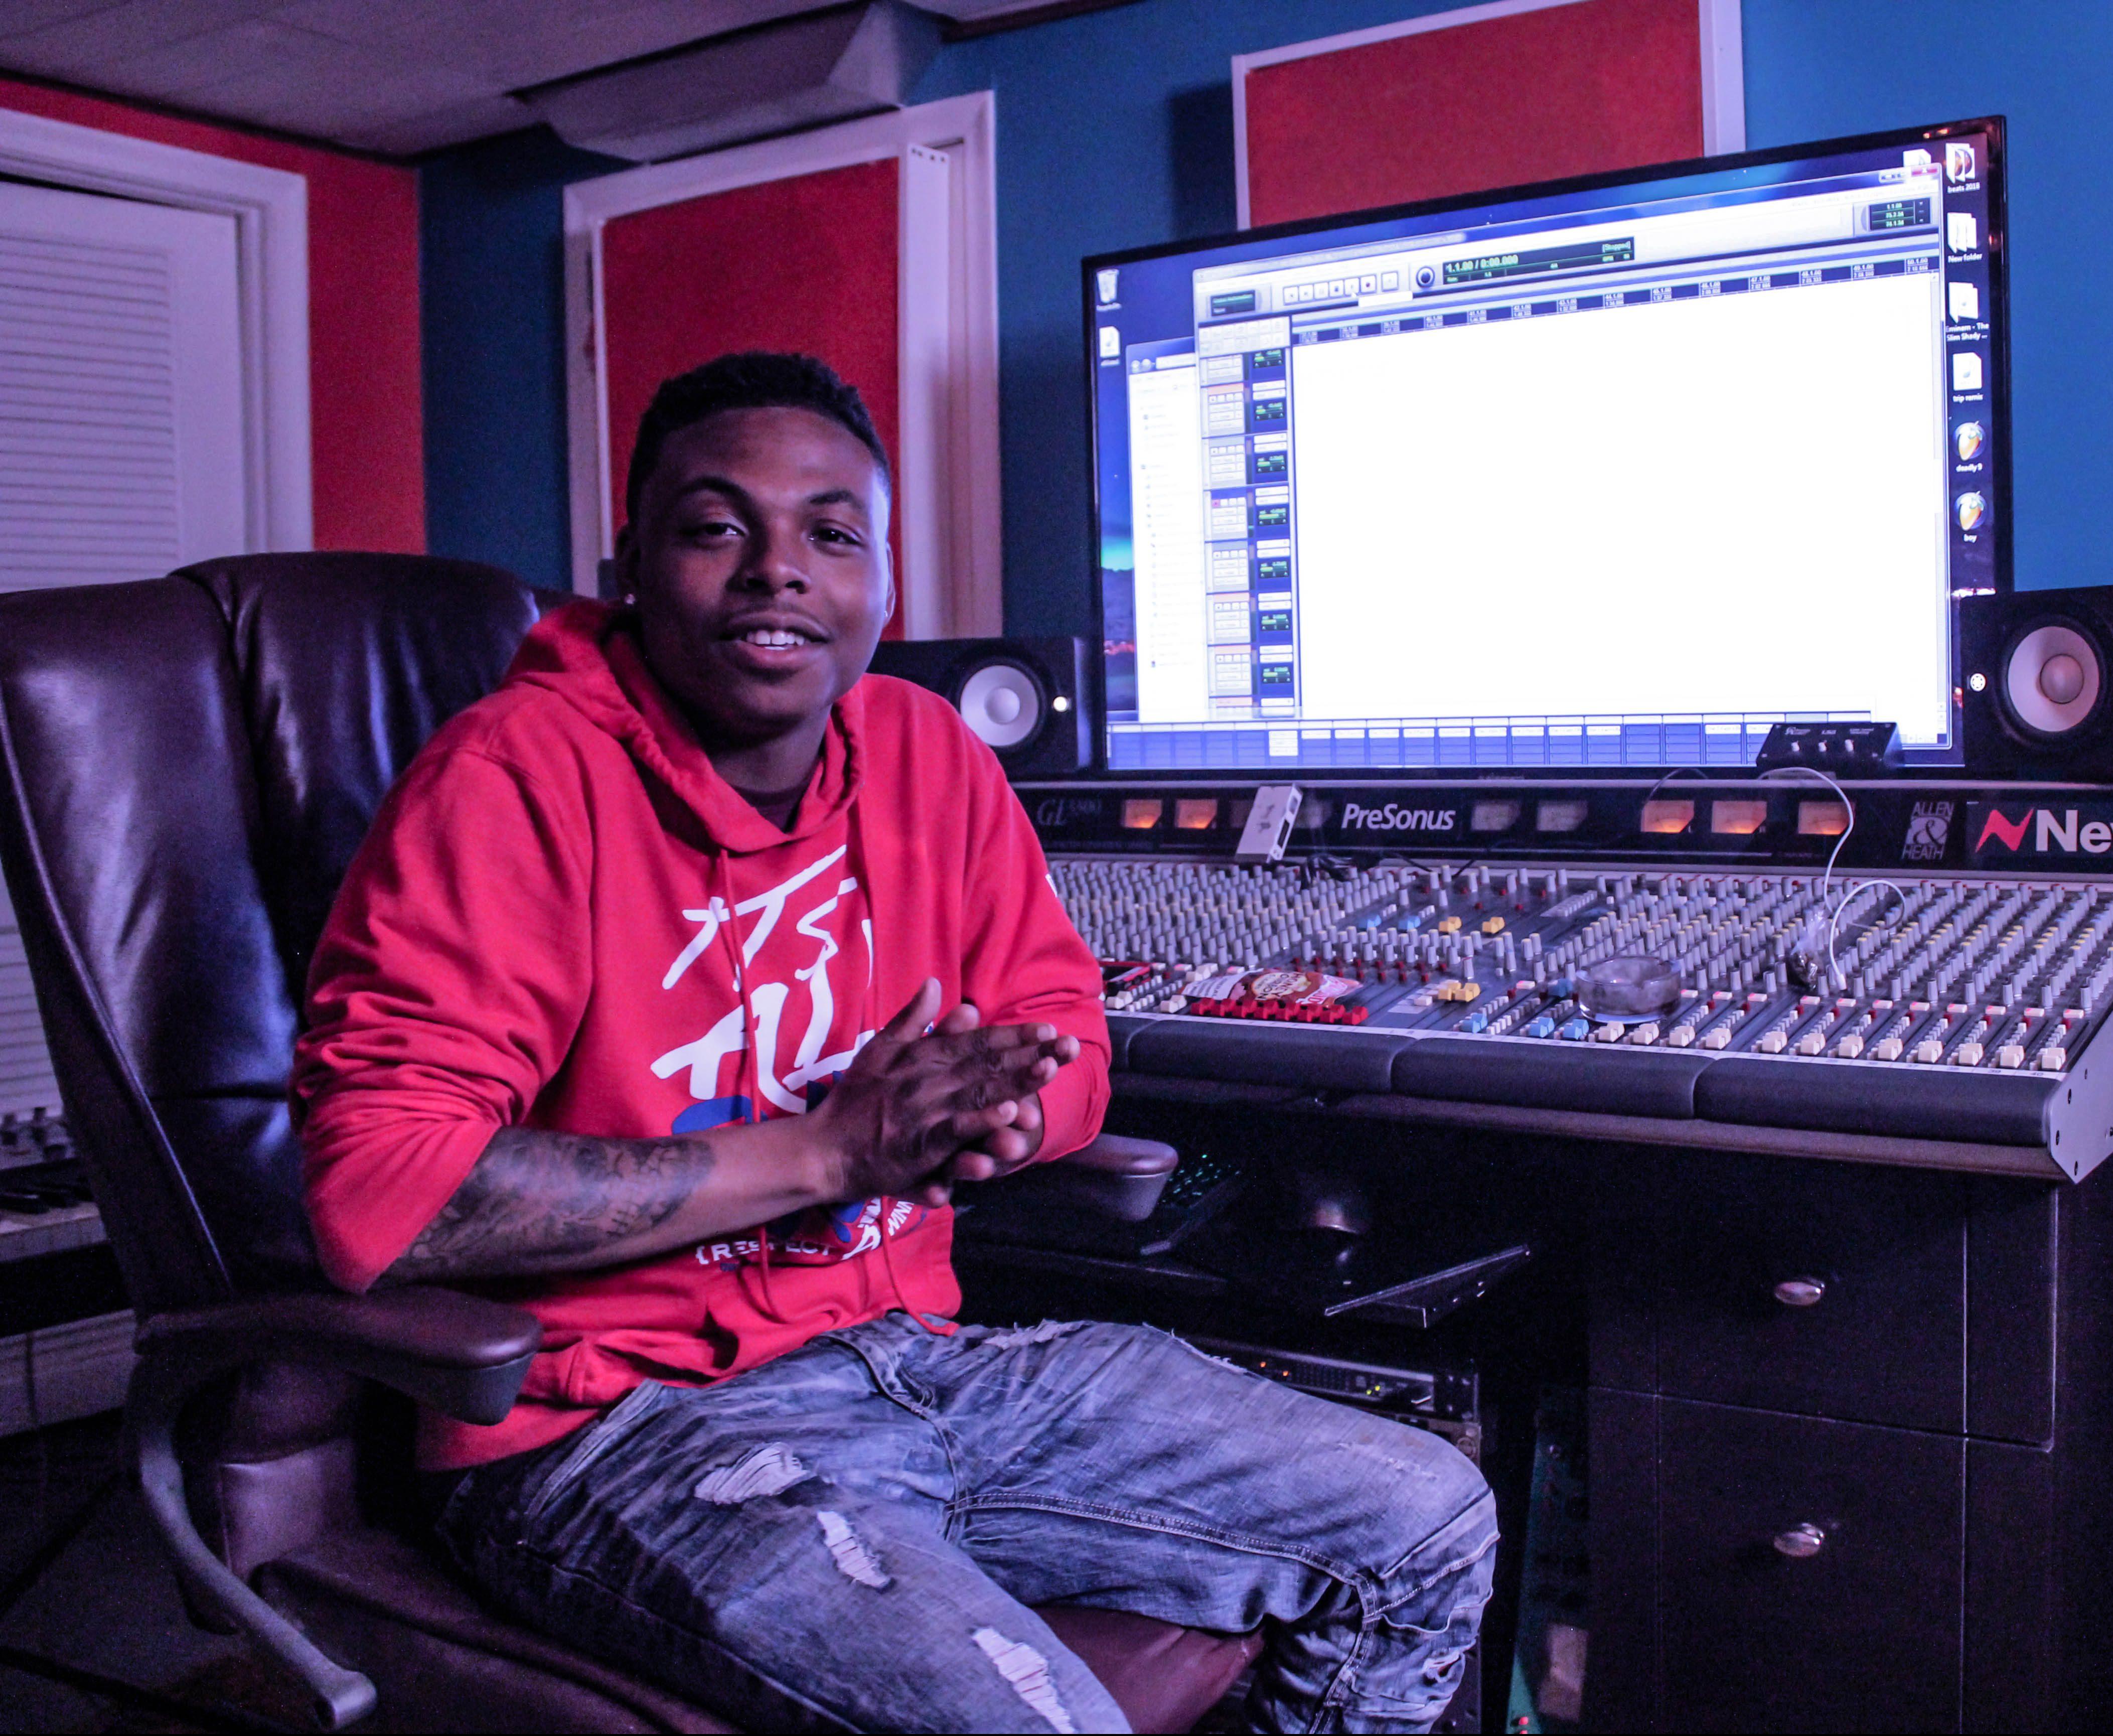 Michigan-based Artist Jerome Whitaker Drops Off 'RoseAnna' Album